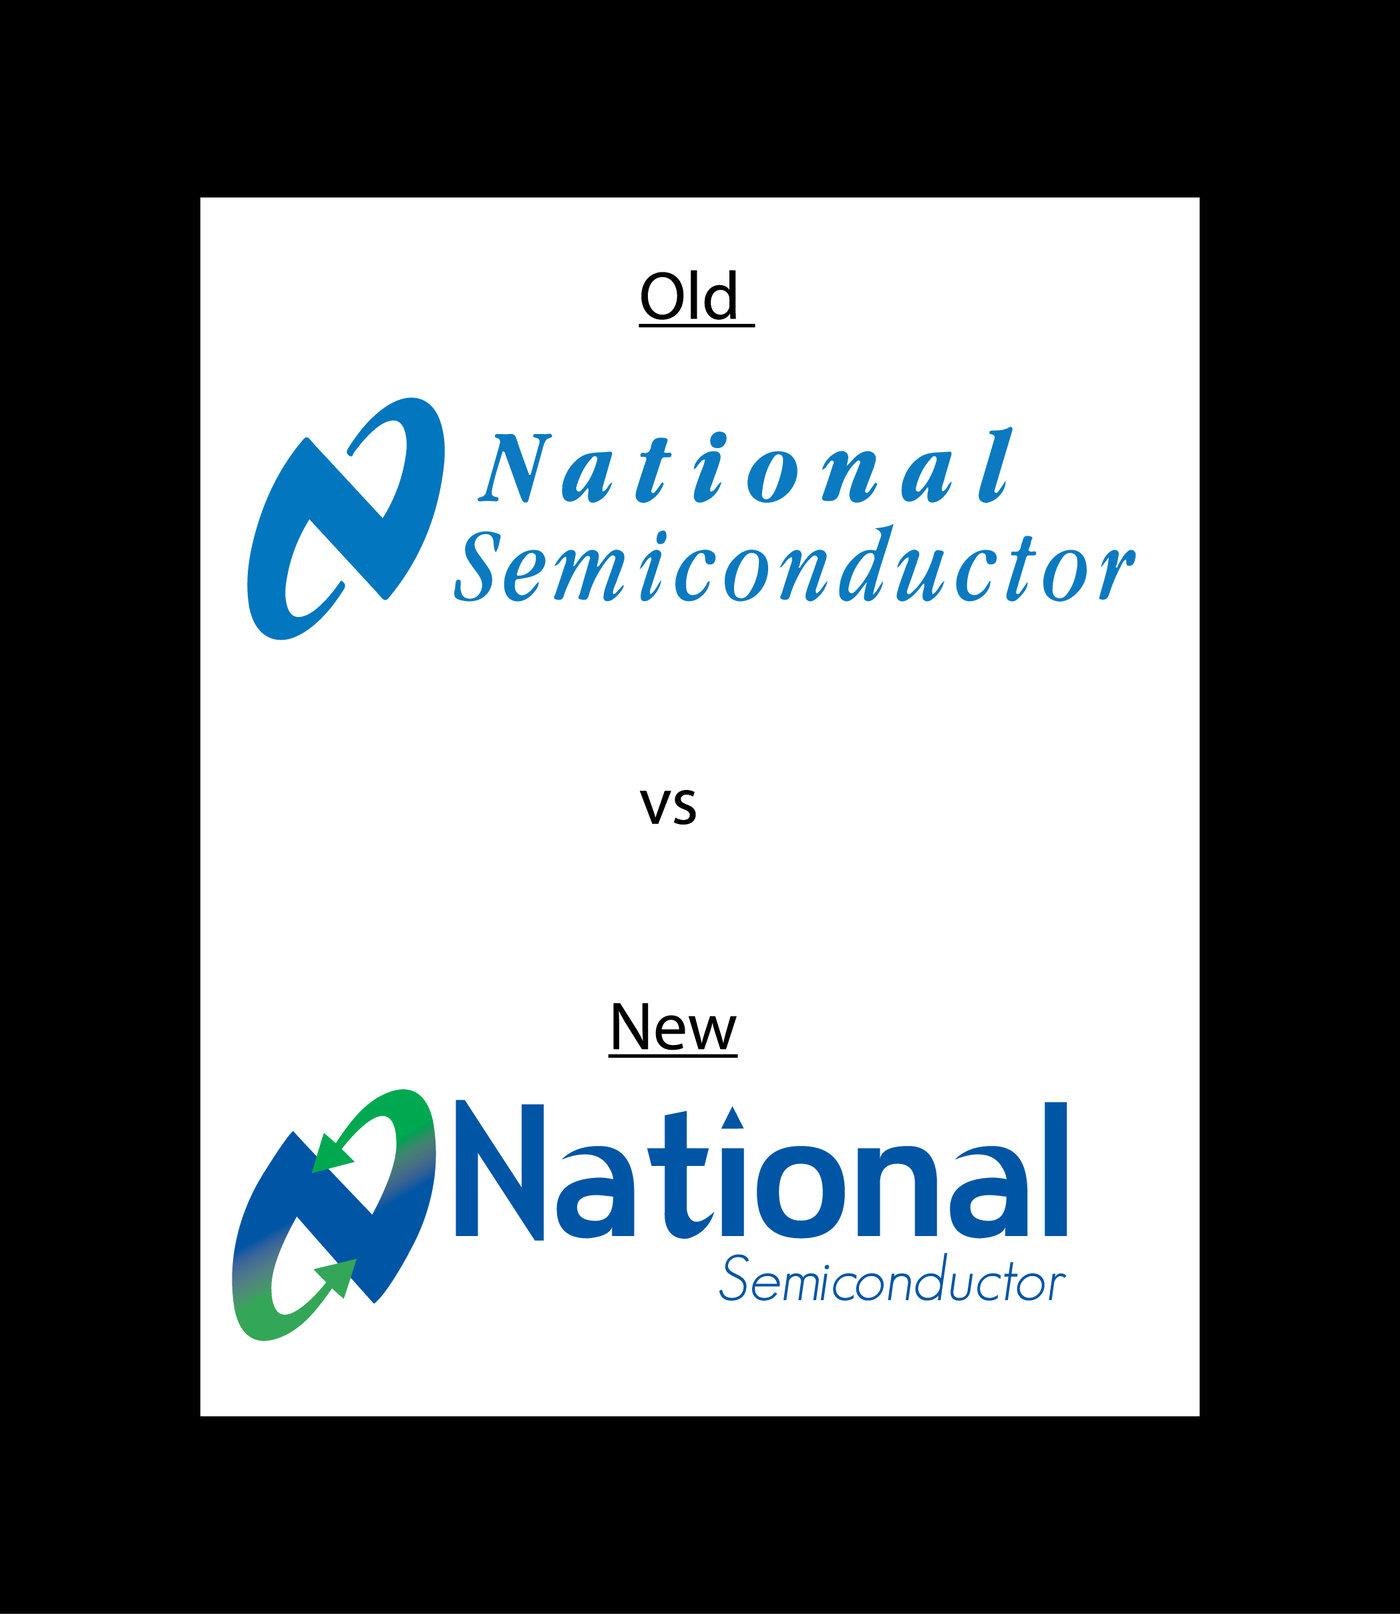 National Semiconductor by Thanhdieu Kristina Ngo at Coroflot com